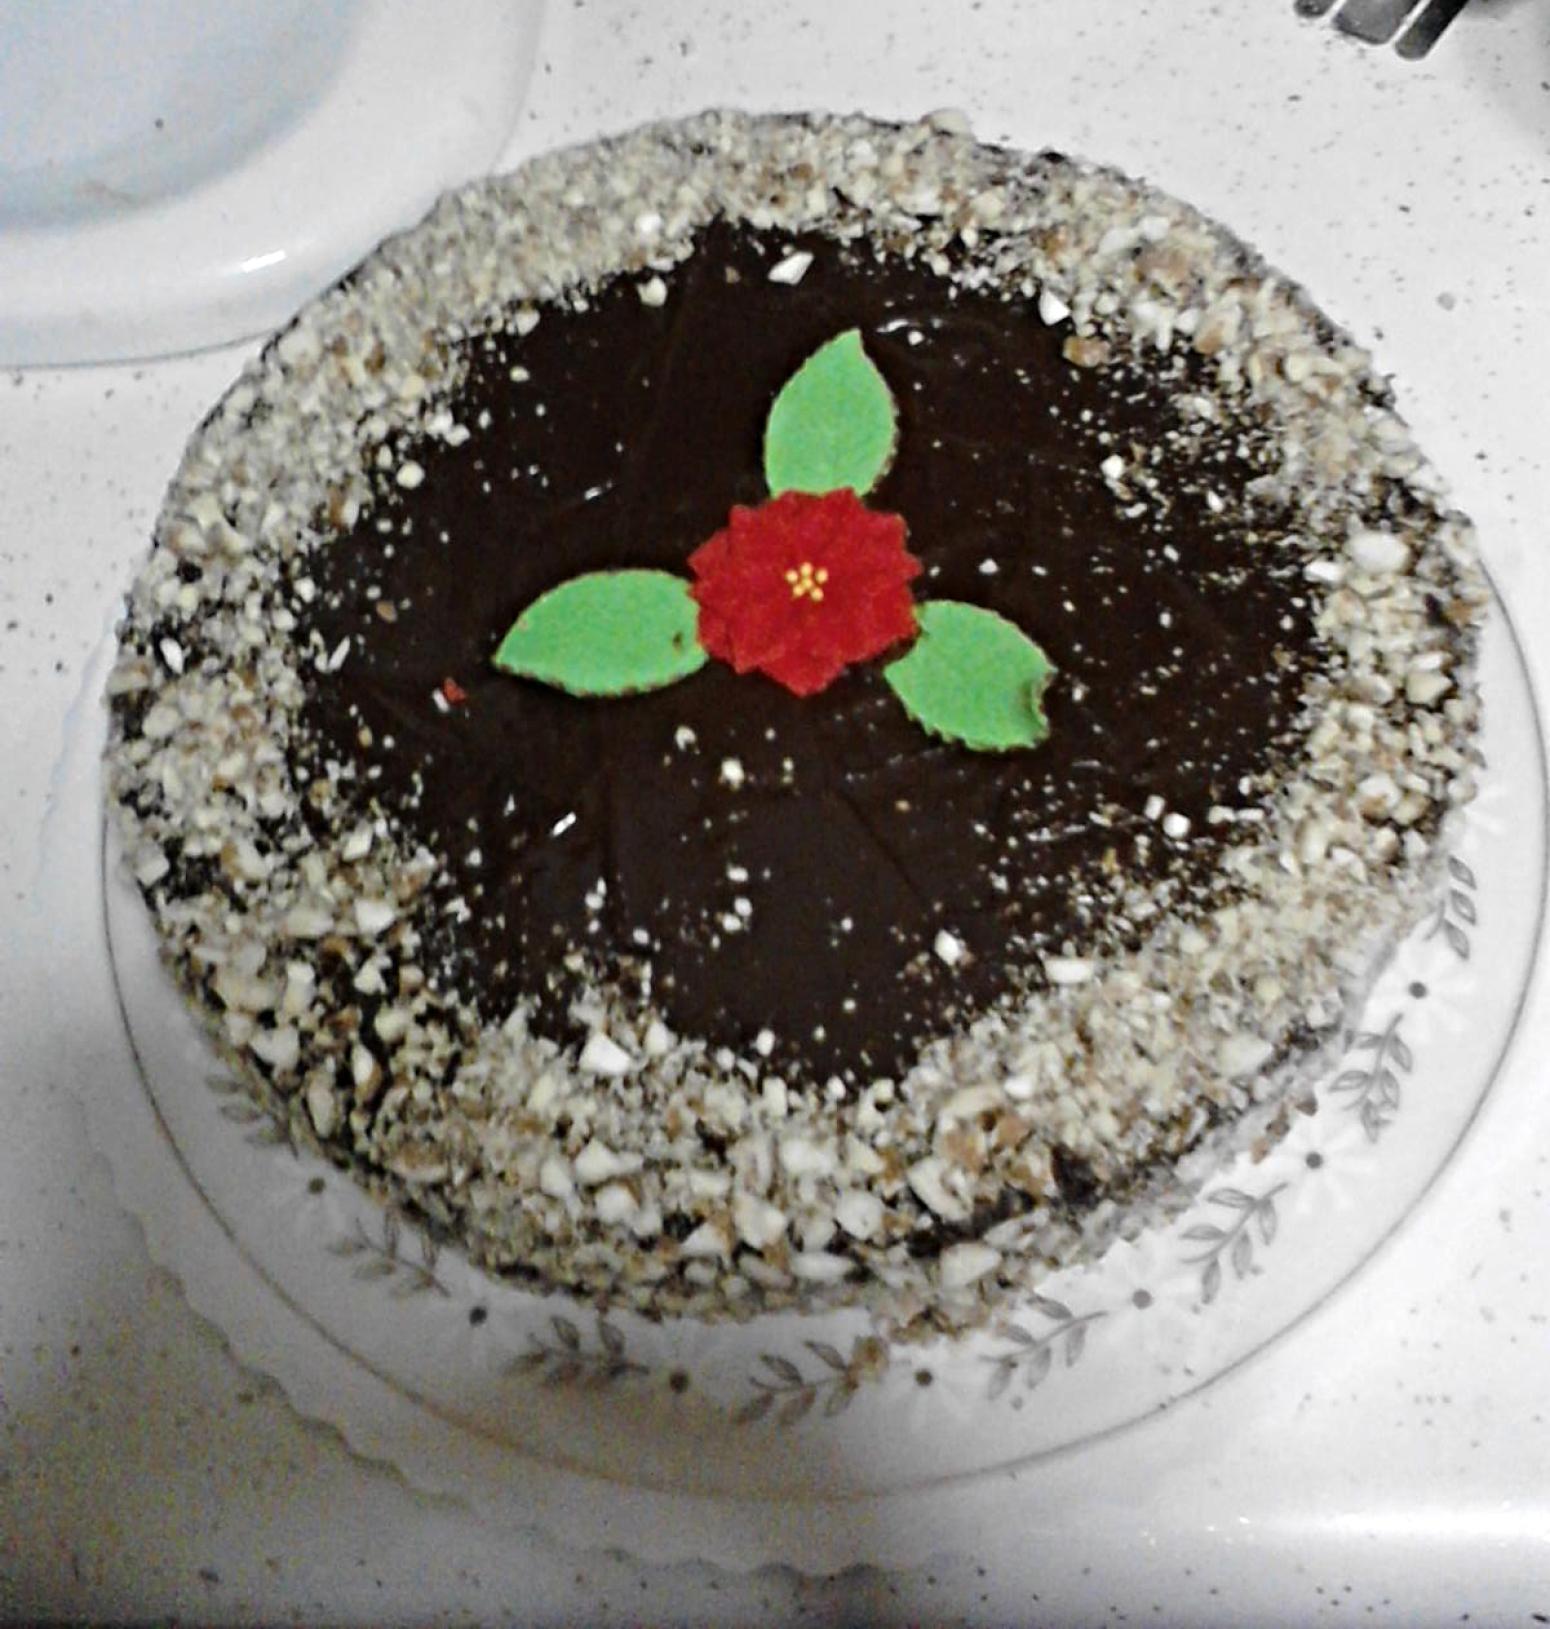 Mandel Baum Torte/Kuchen-German 4 Almond Tree Cake Recipe